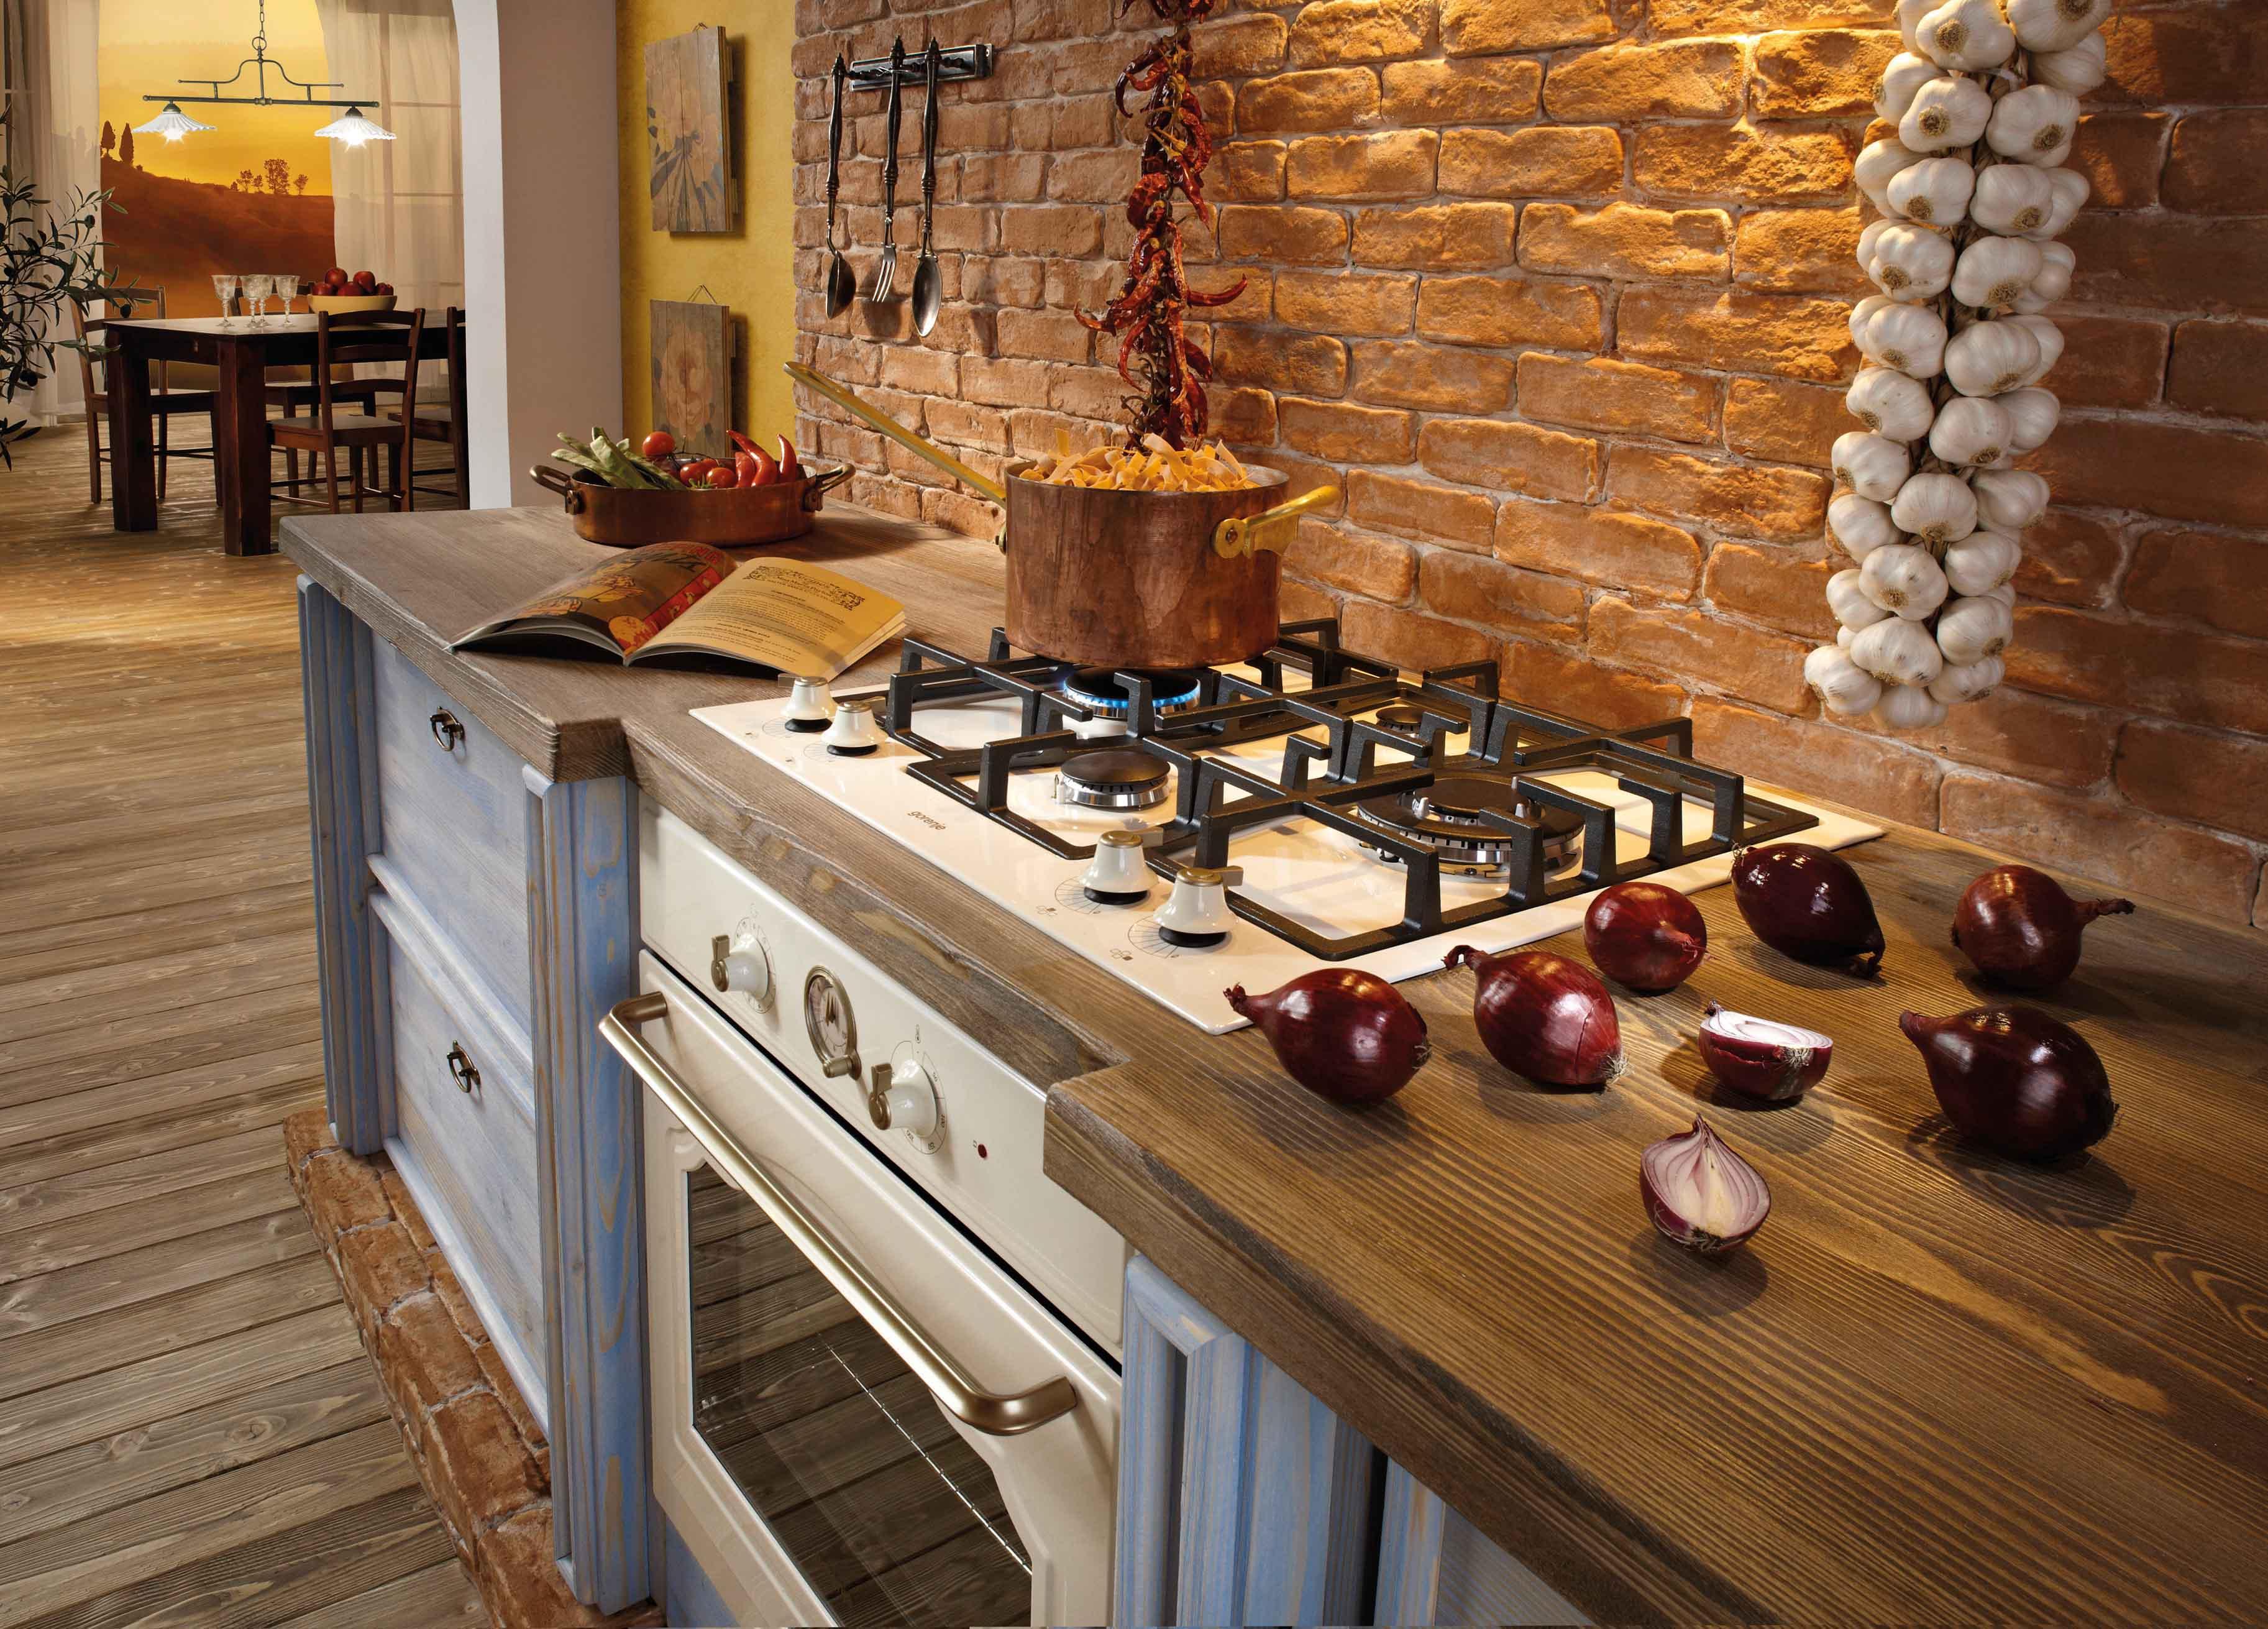 Classico di gorenje cucine freestanding piani cottura e for Piani di casa storici